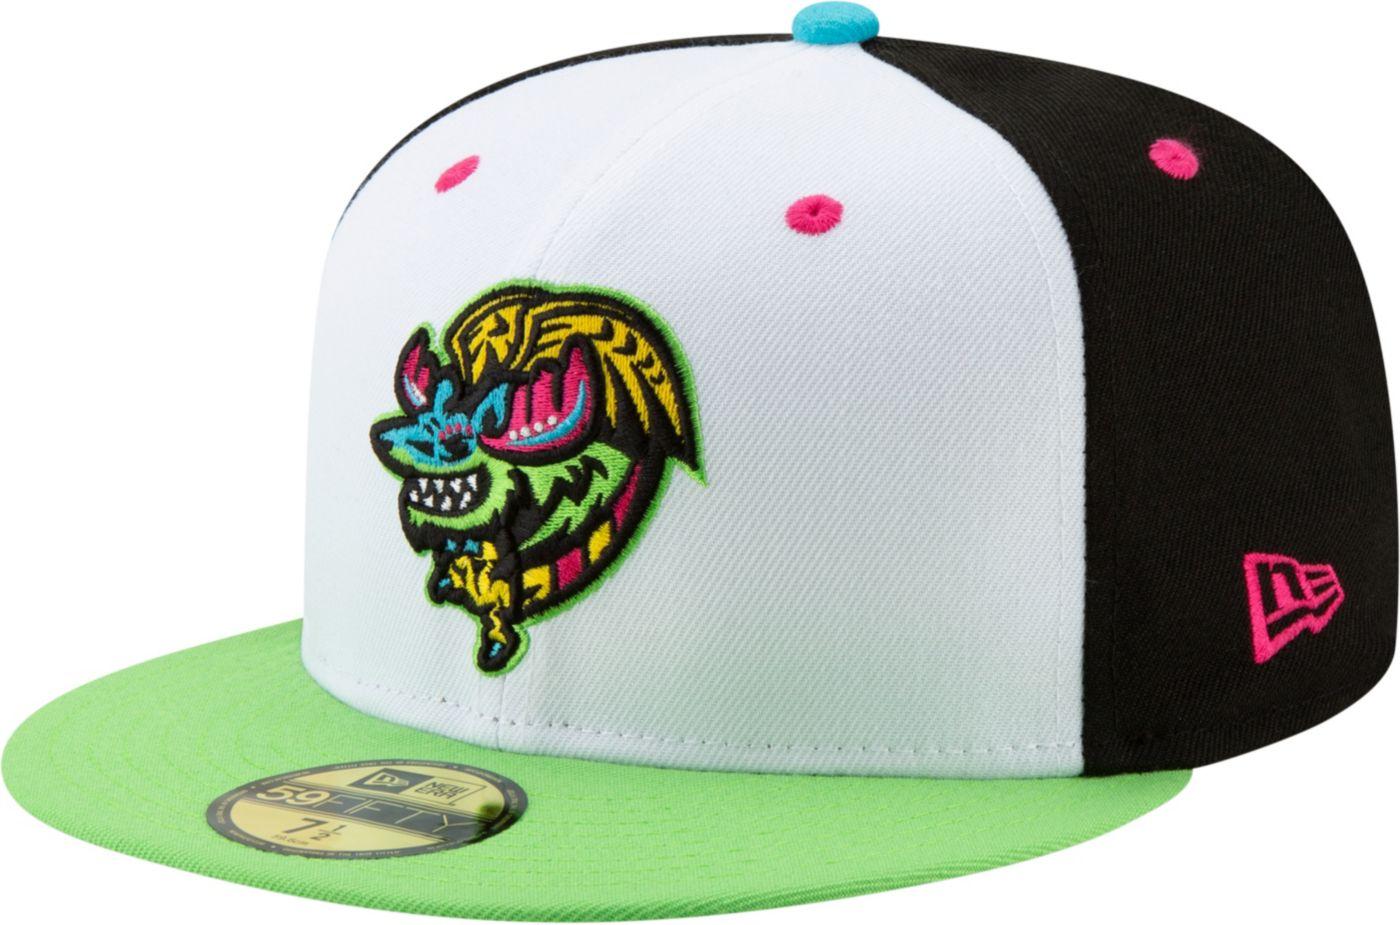 New Era Men's Modesto Nuts 59Fifty 2019 COPA Authentic Hat